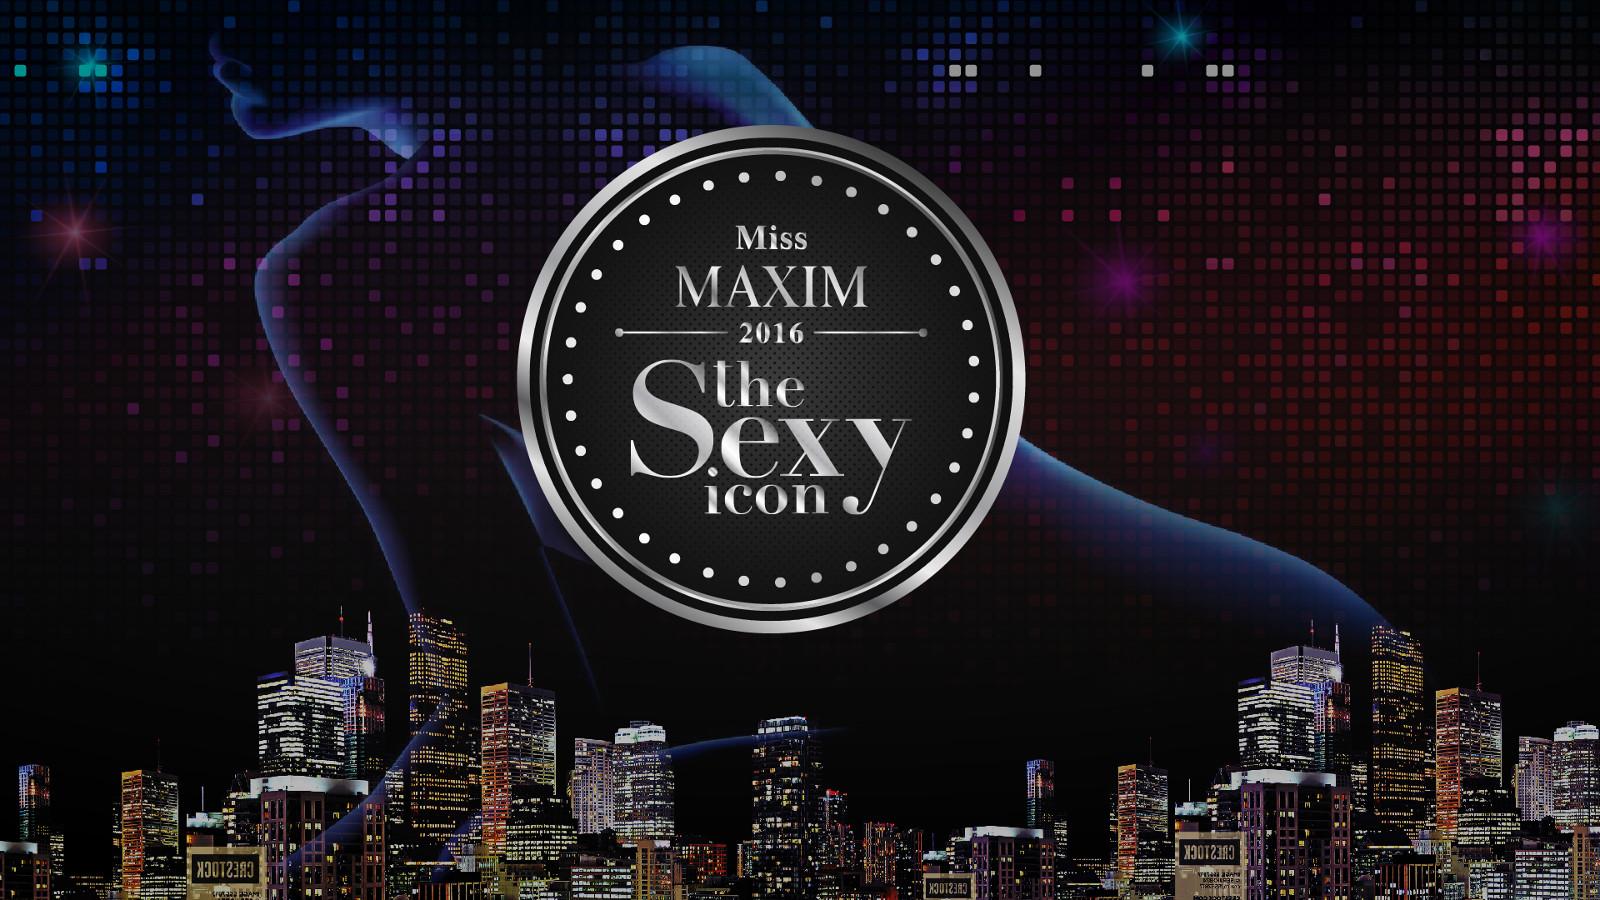 Miss MAXIM 2016 the Sexy Icon (MX131-MX140)